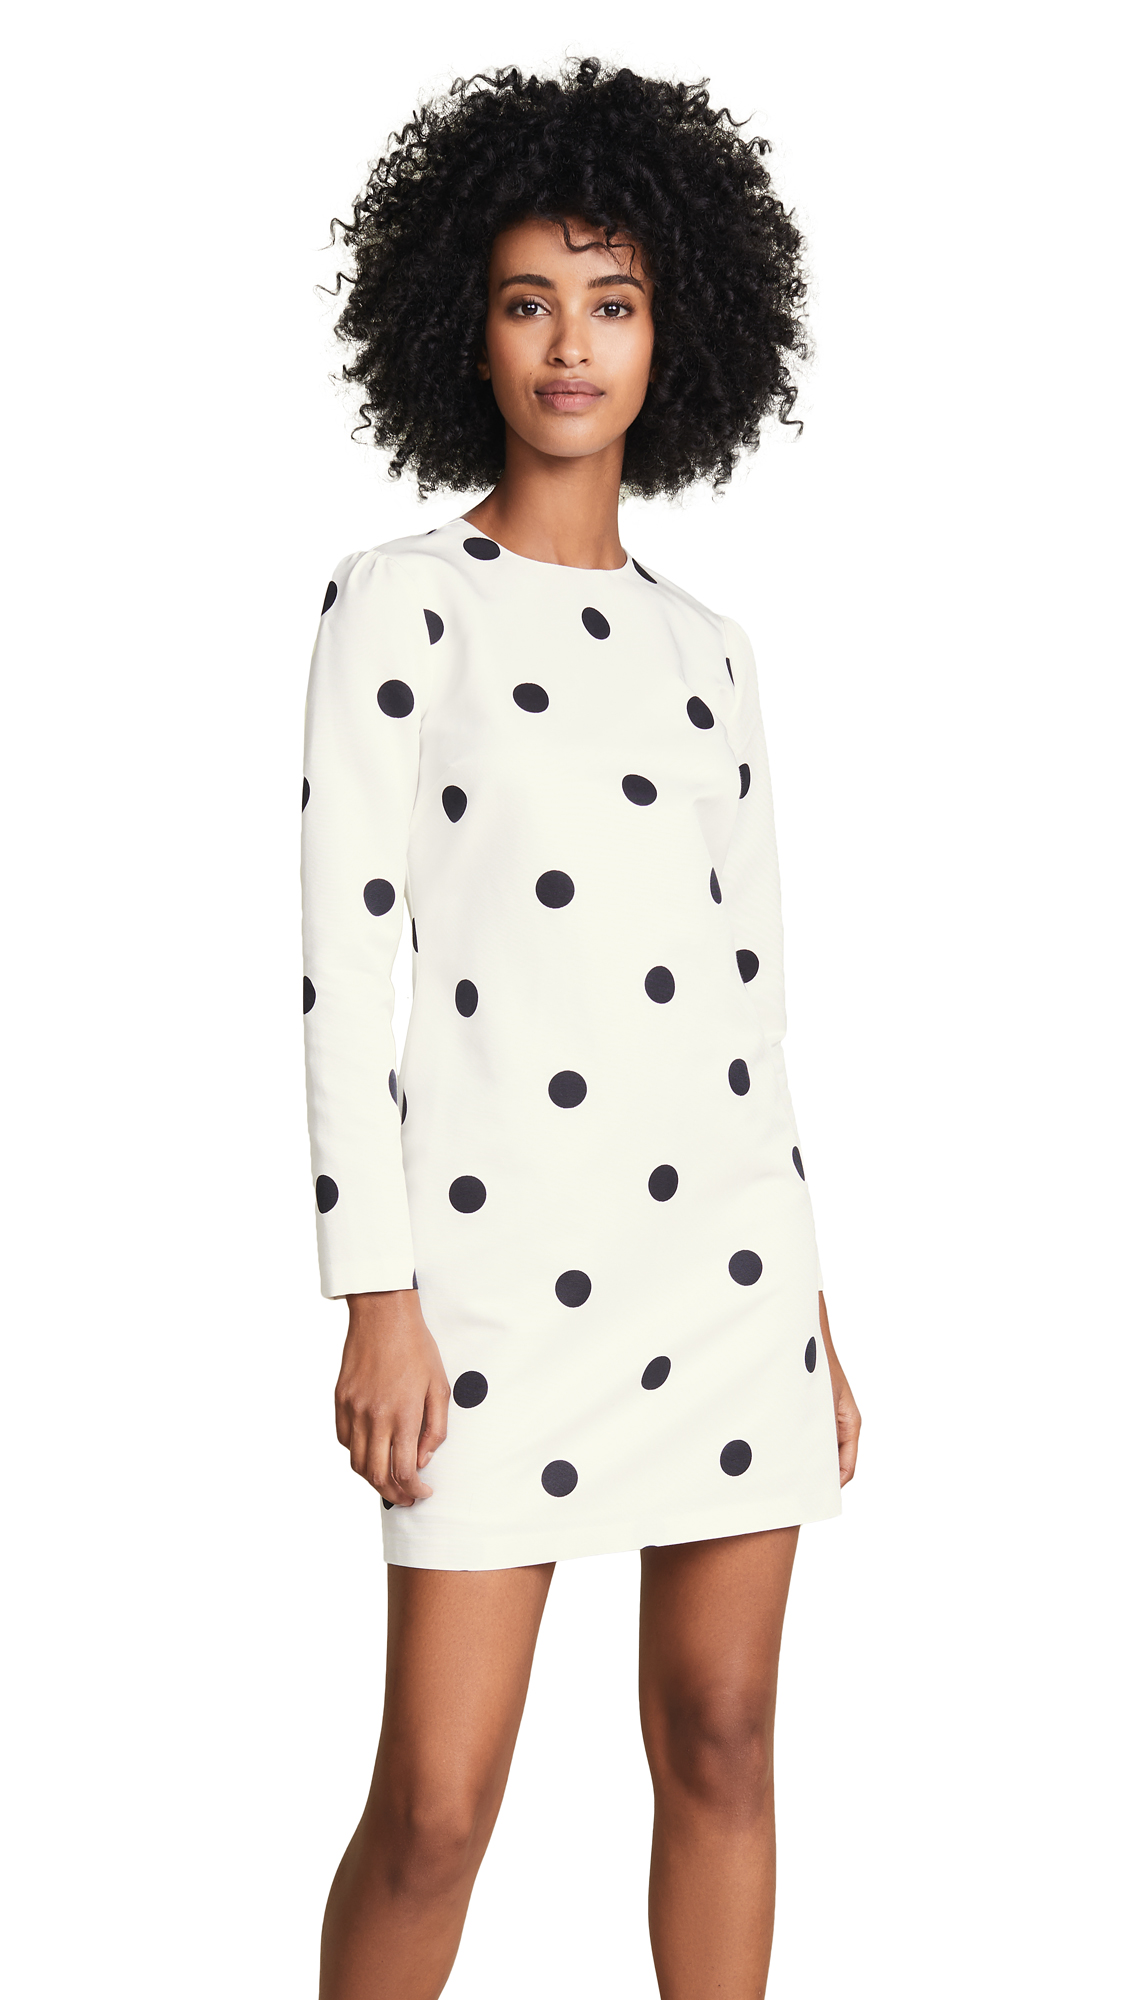 Cynthia Rowley Polka Dot Long Sleeve Shift Dress